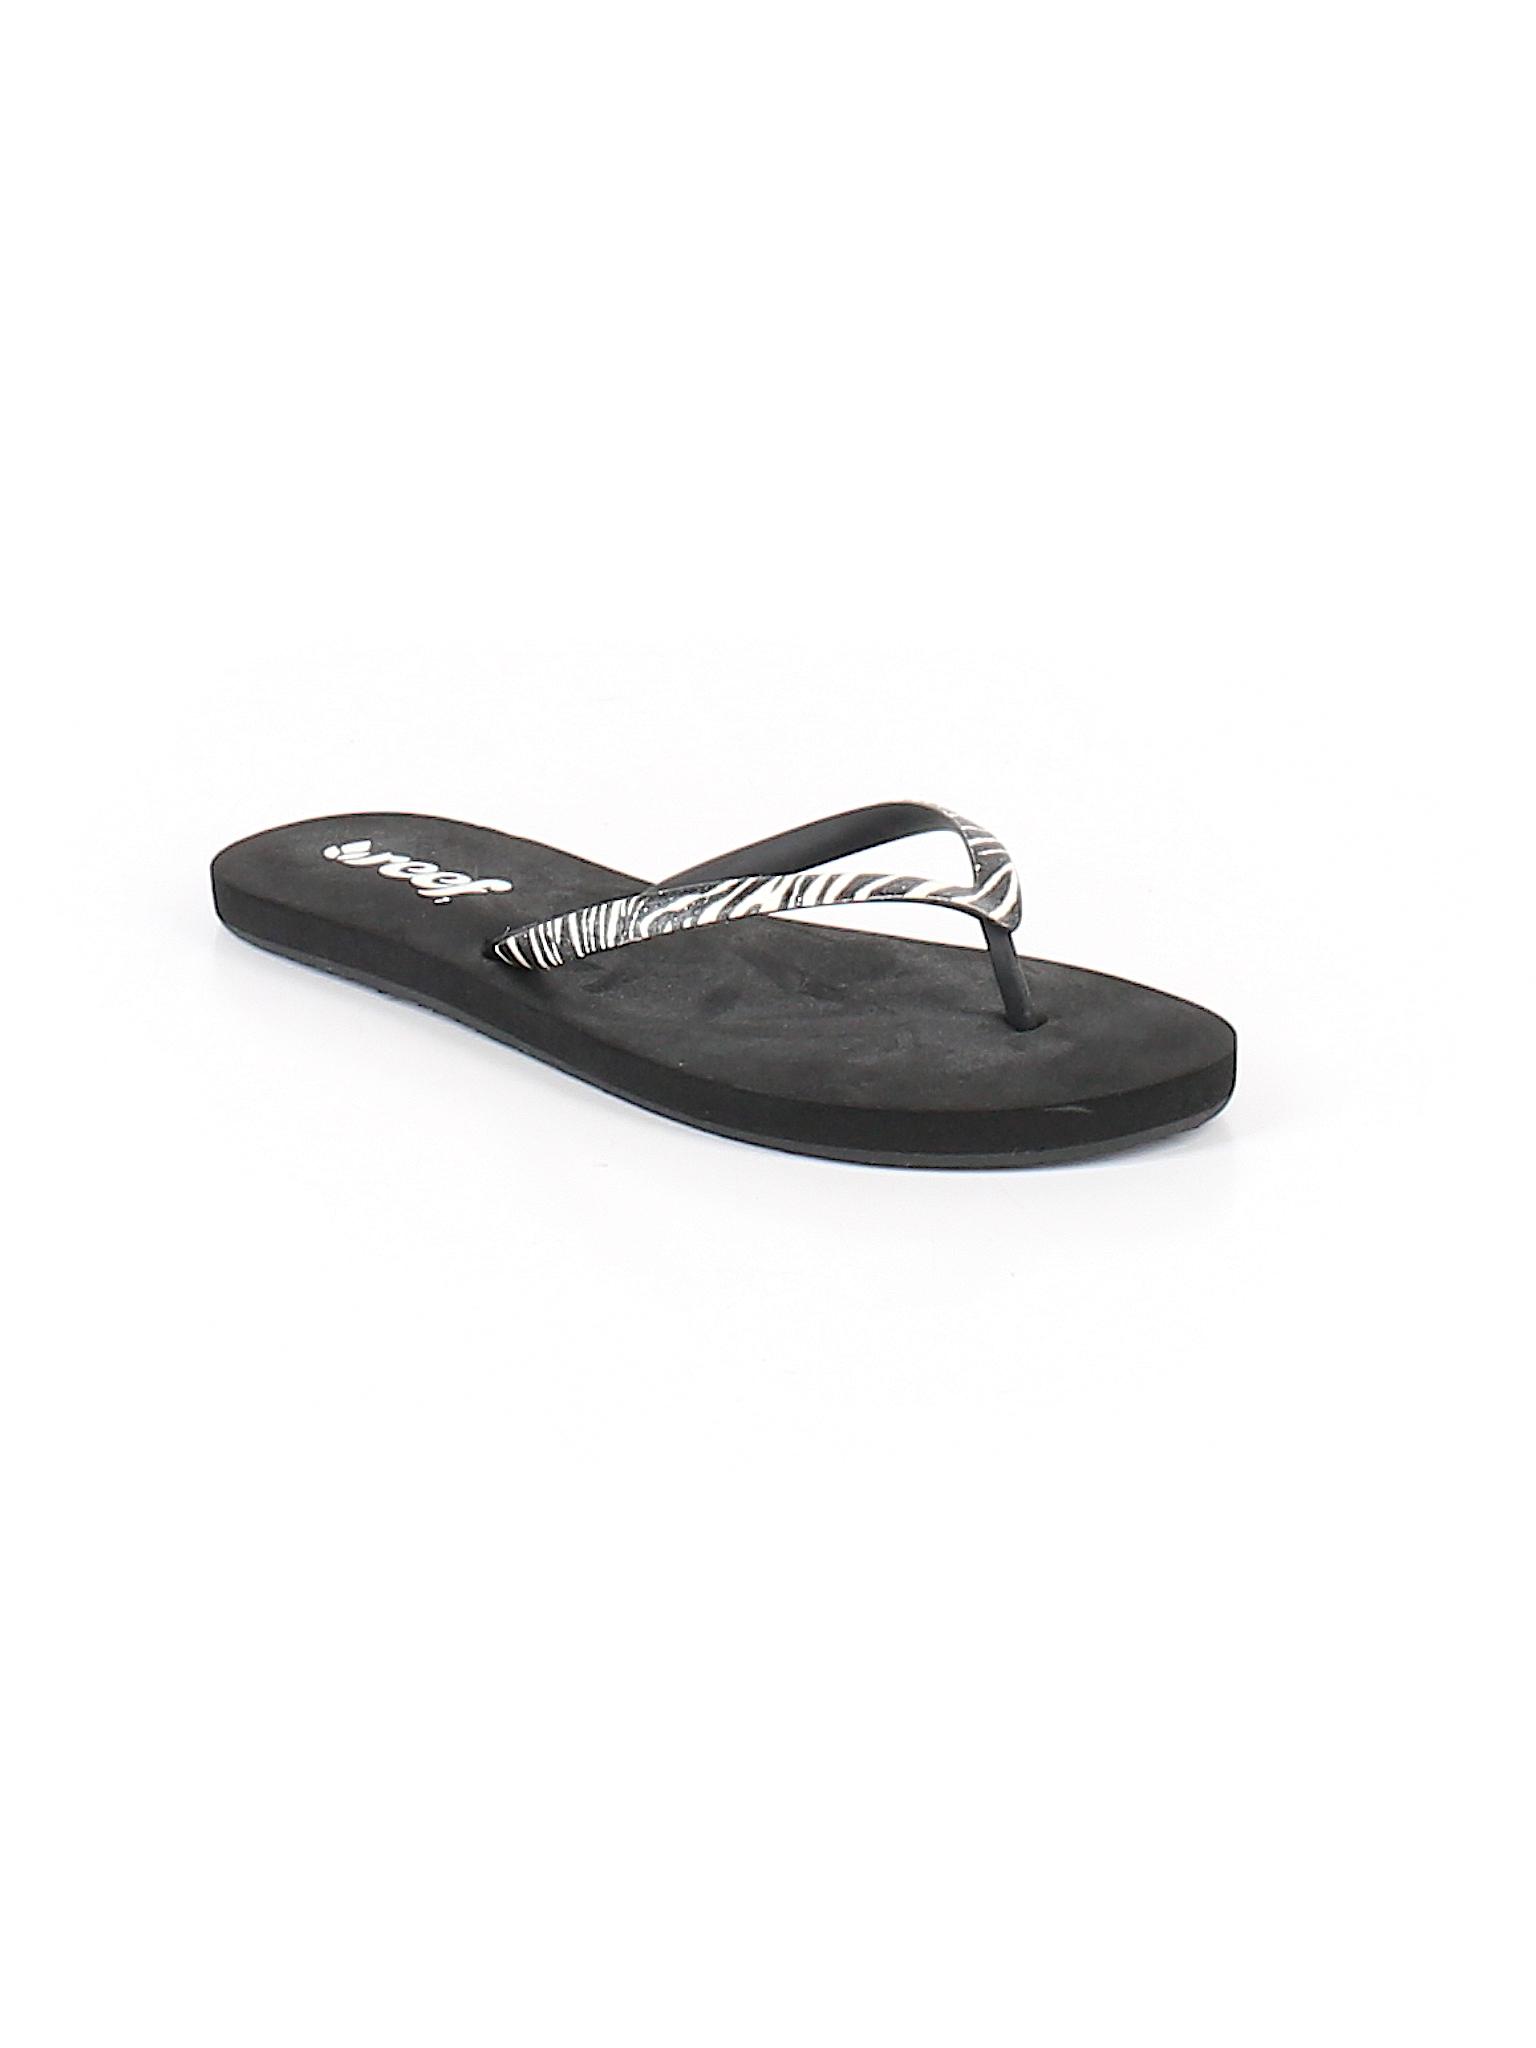 7d42e18d0797 Reef Flip Flops  Size 6.00 Black Women s Clothing -  6.99 Reef Flip Flops